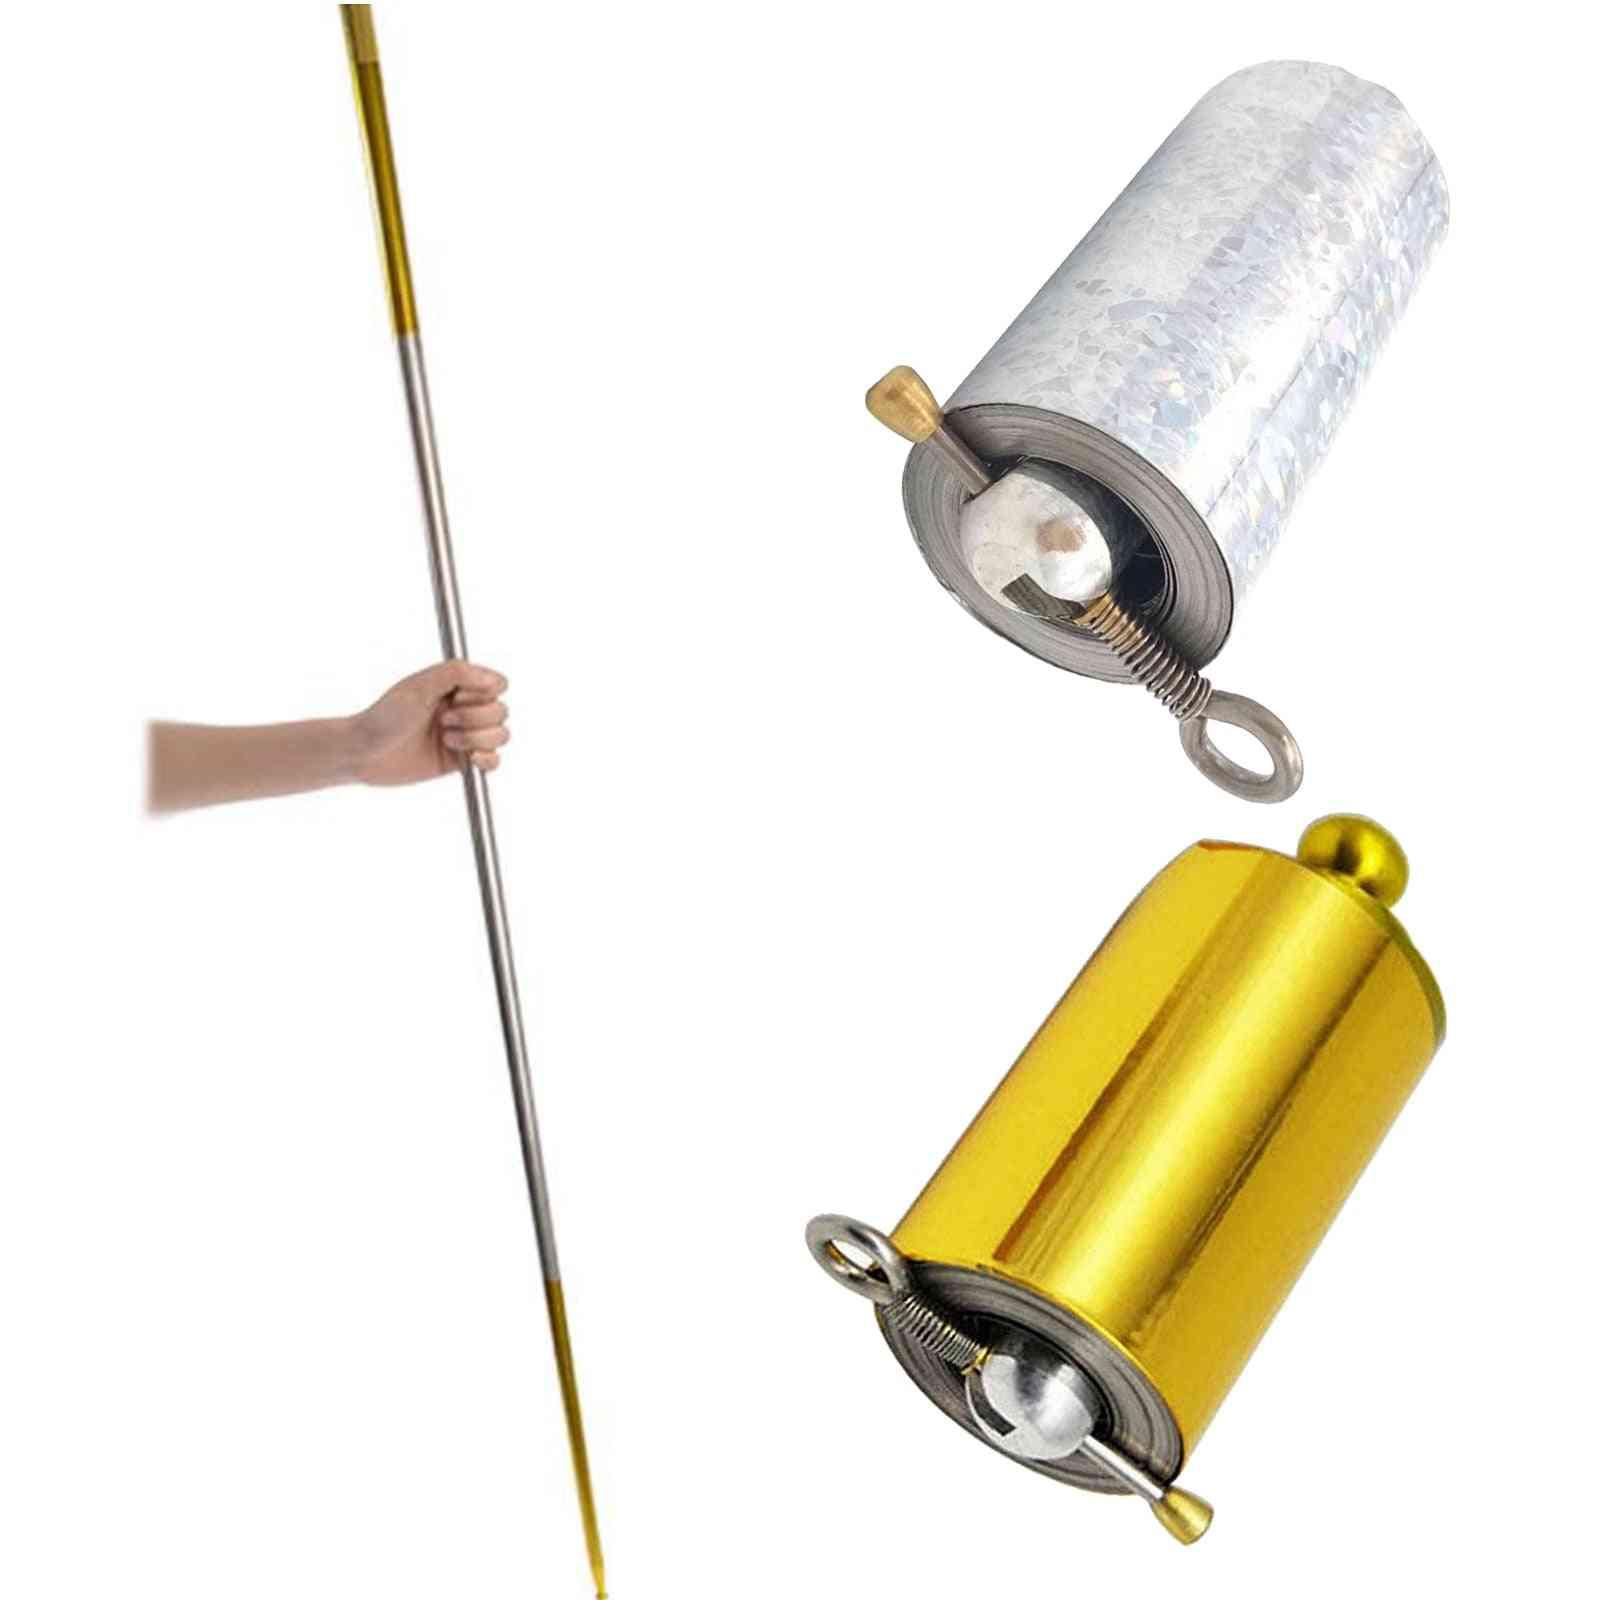 Portable Martial Arts Pocket Tricks Telescopic Rod Staff Stick